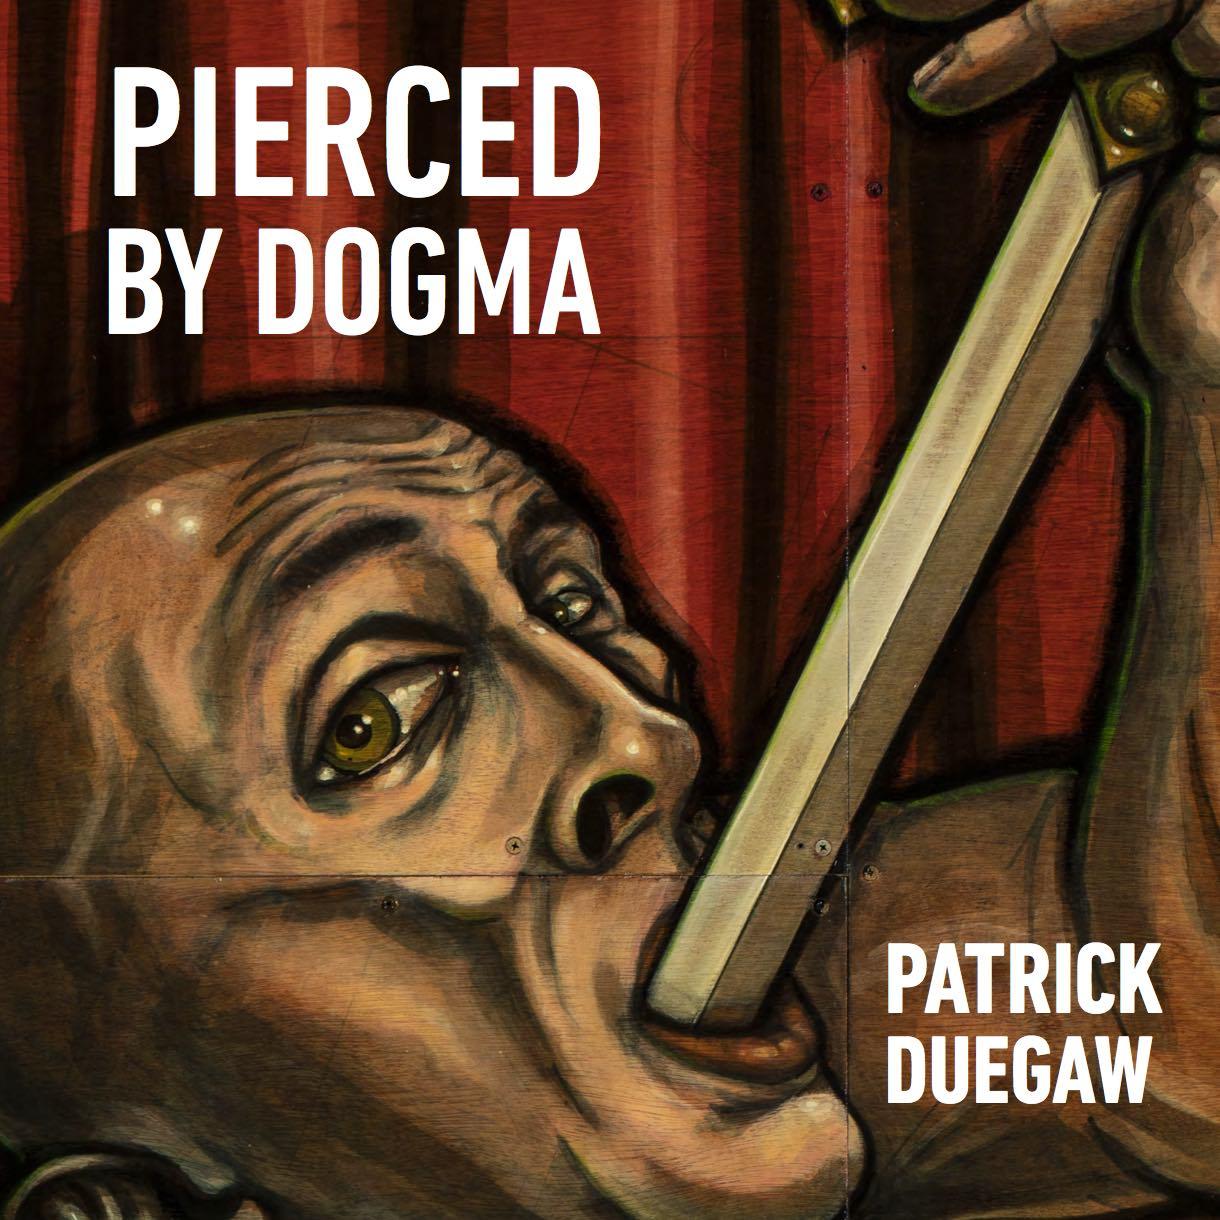 Patrick Duegaw